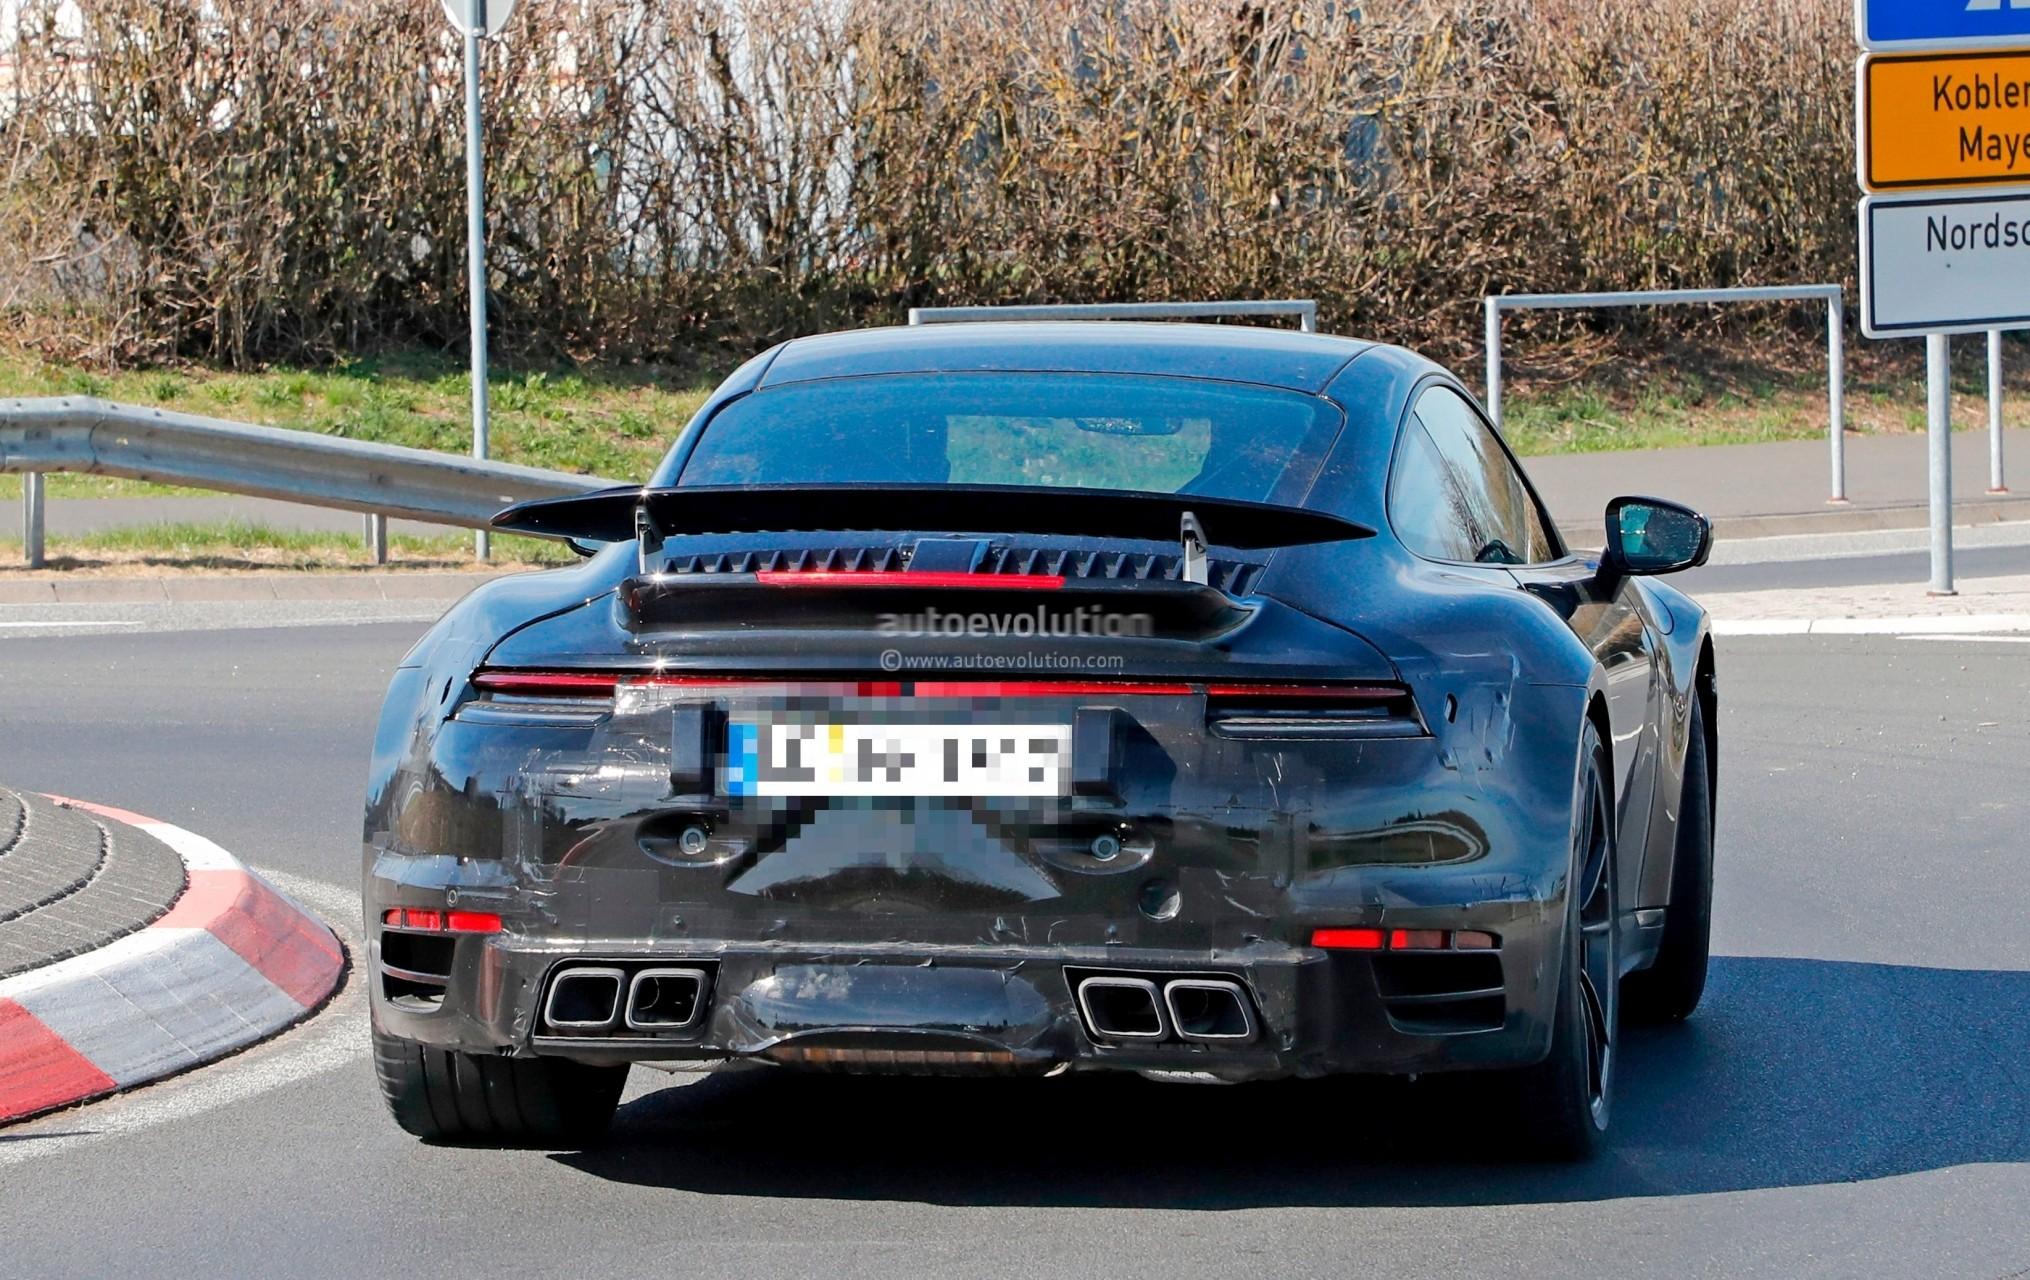 Spyshots 2020 Porsche 911 Turbo Shows New Active Rear